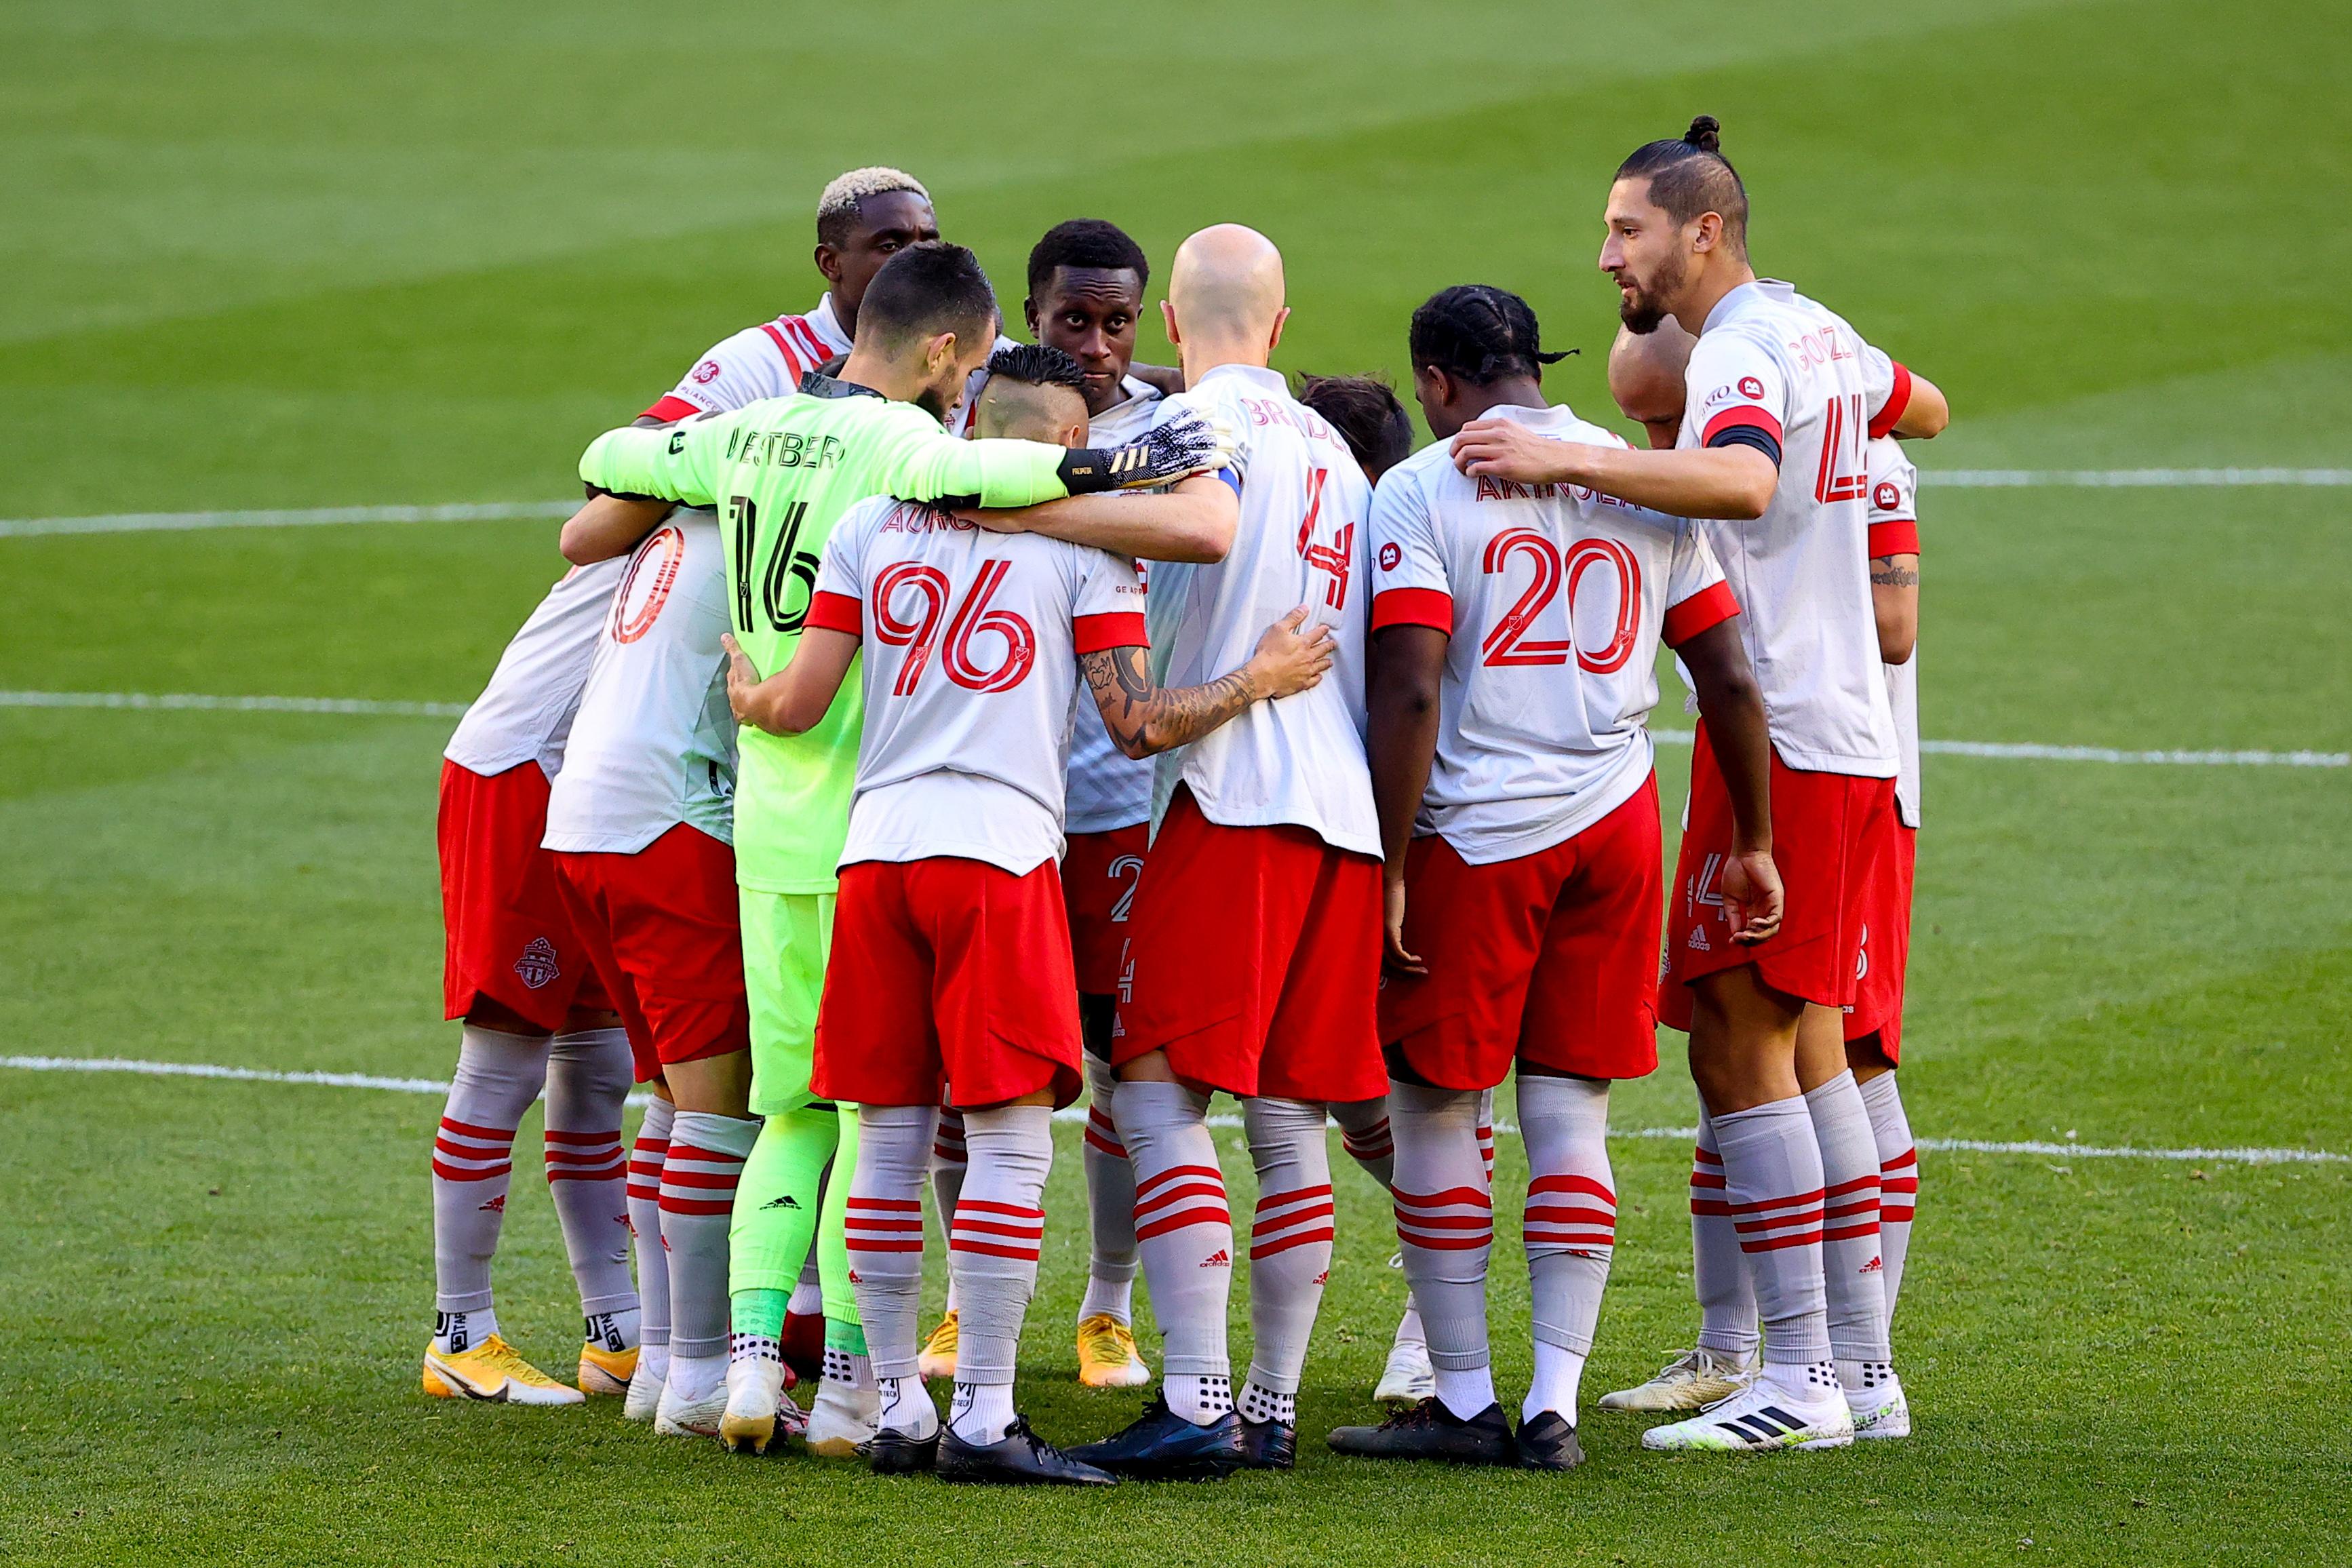 SOCCER: NOV 08 MLS - Toronto FC at New York Red Bulls